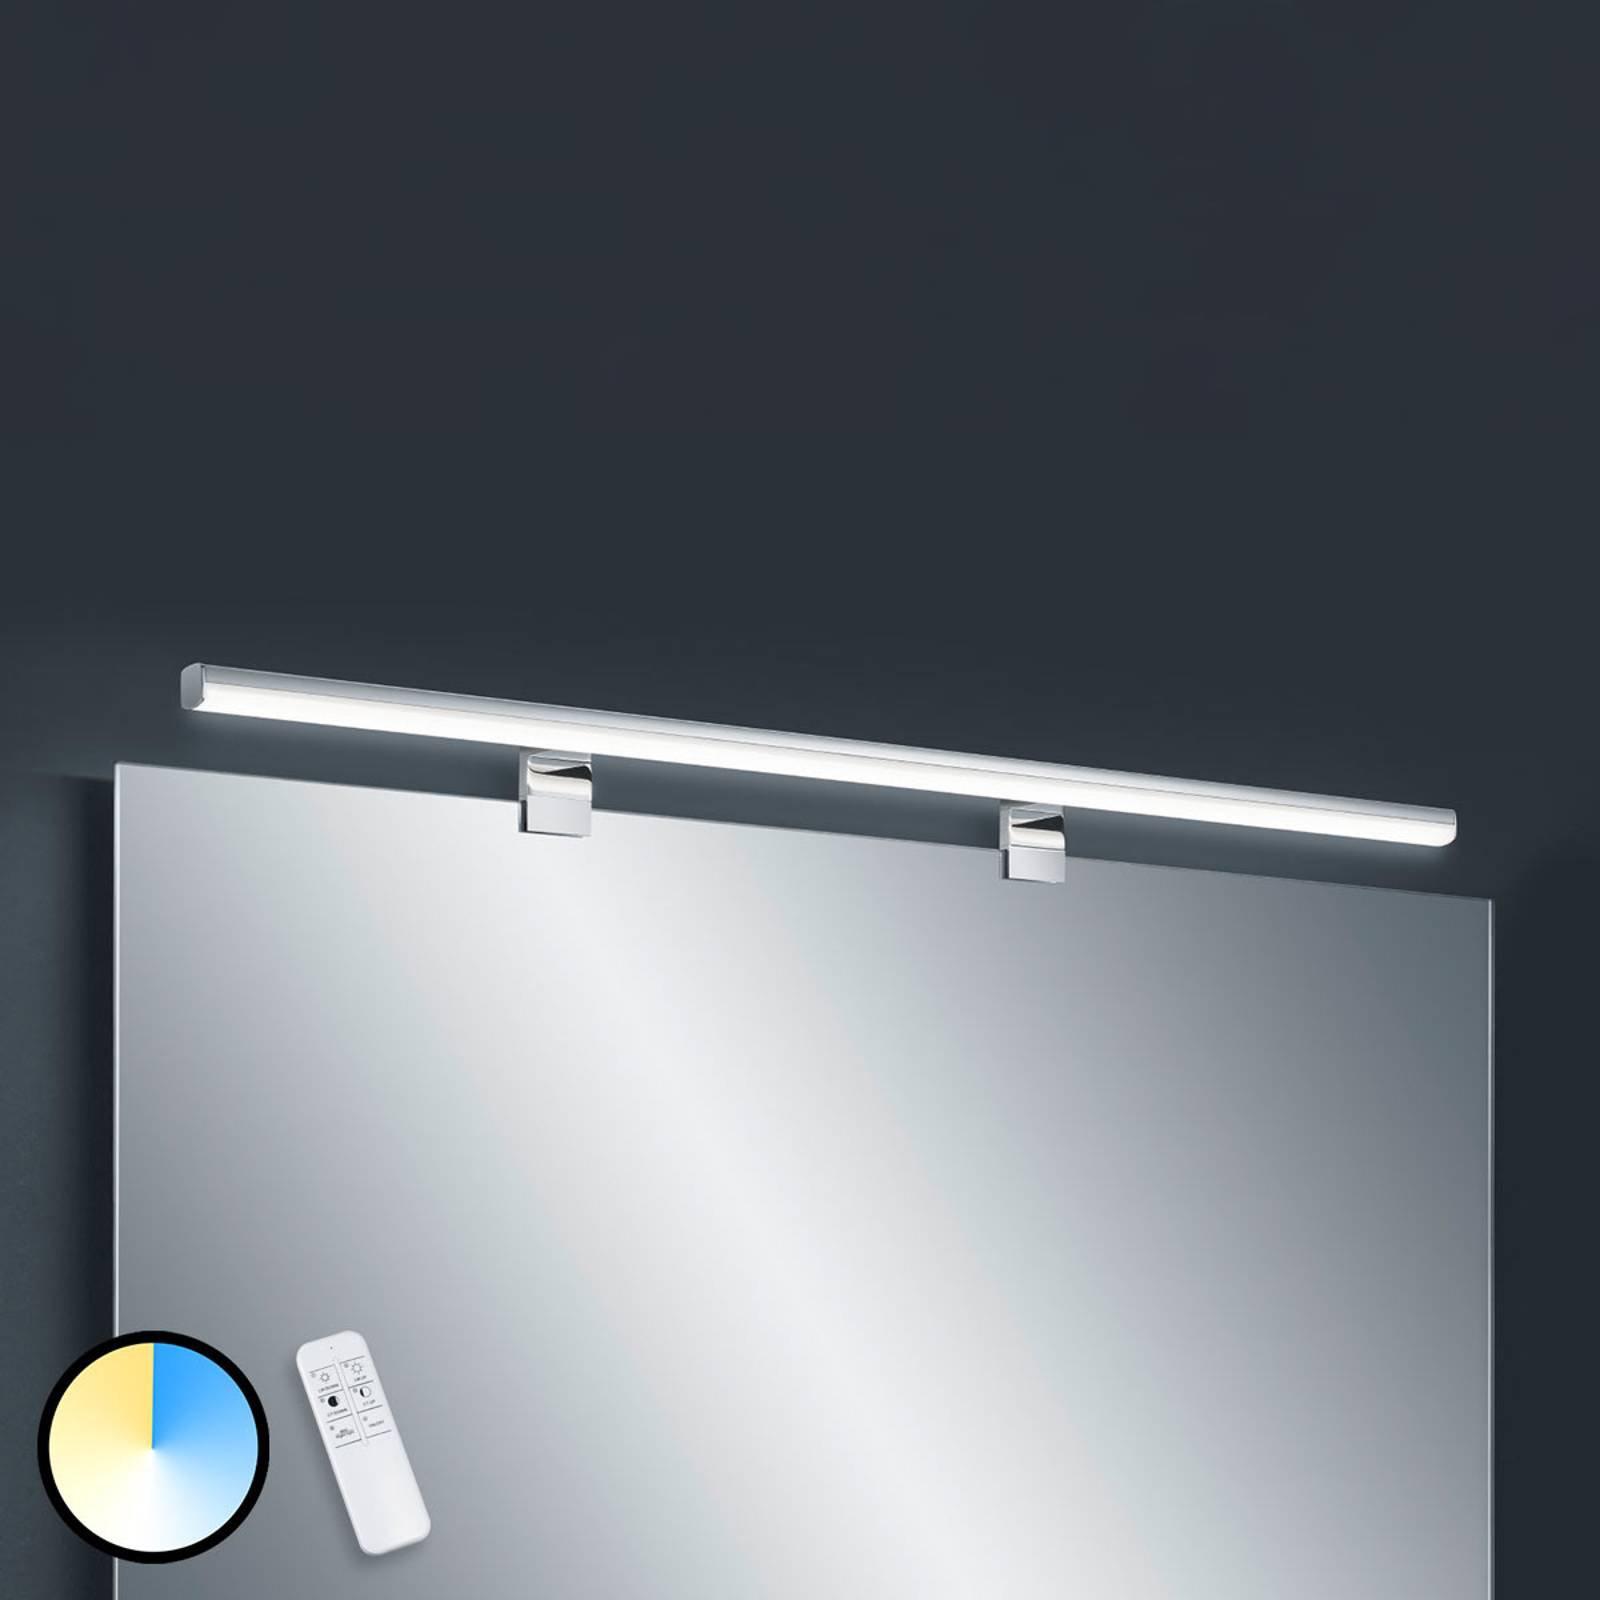 Helestra Gaia LED-speillampe fjernkontroll 99 cm